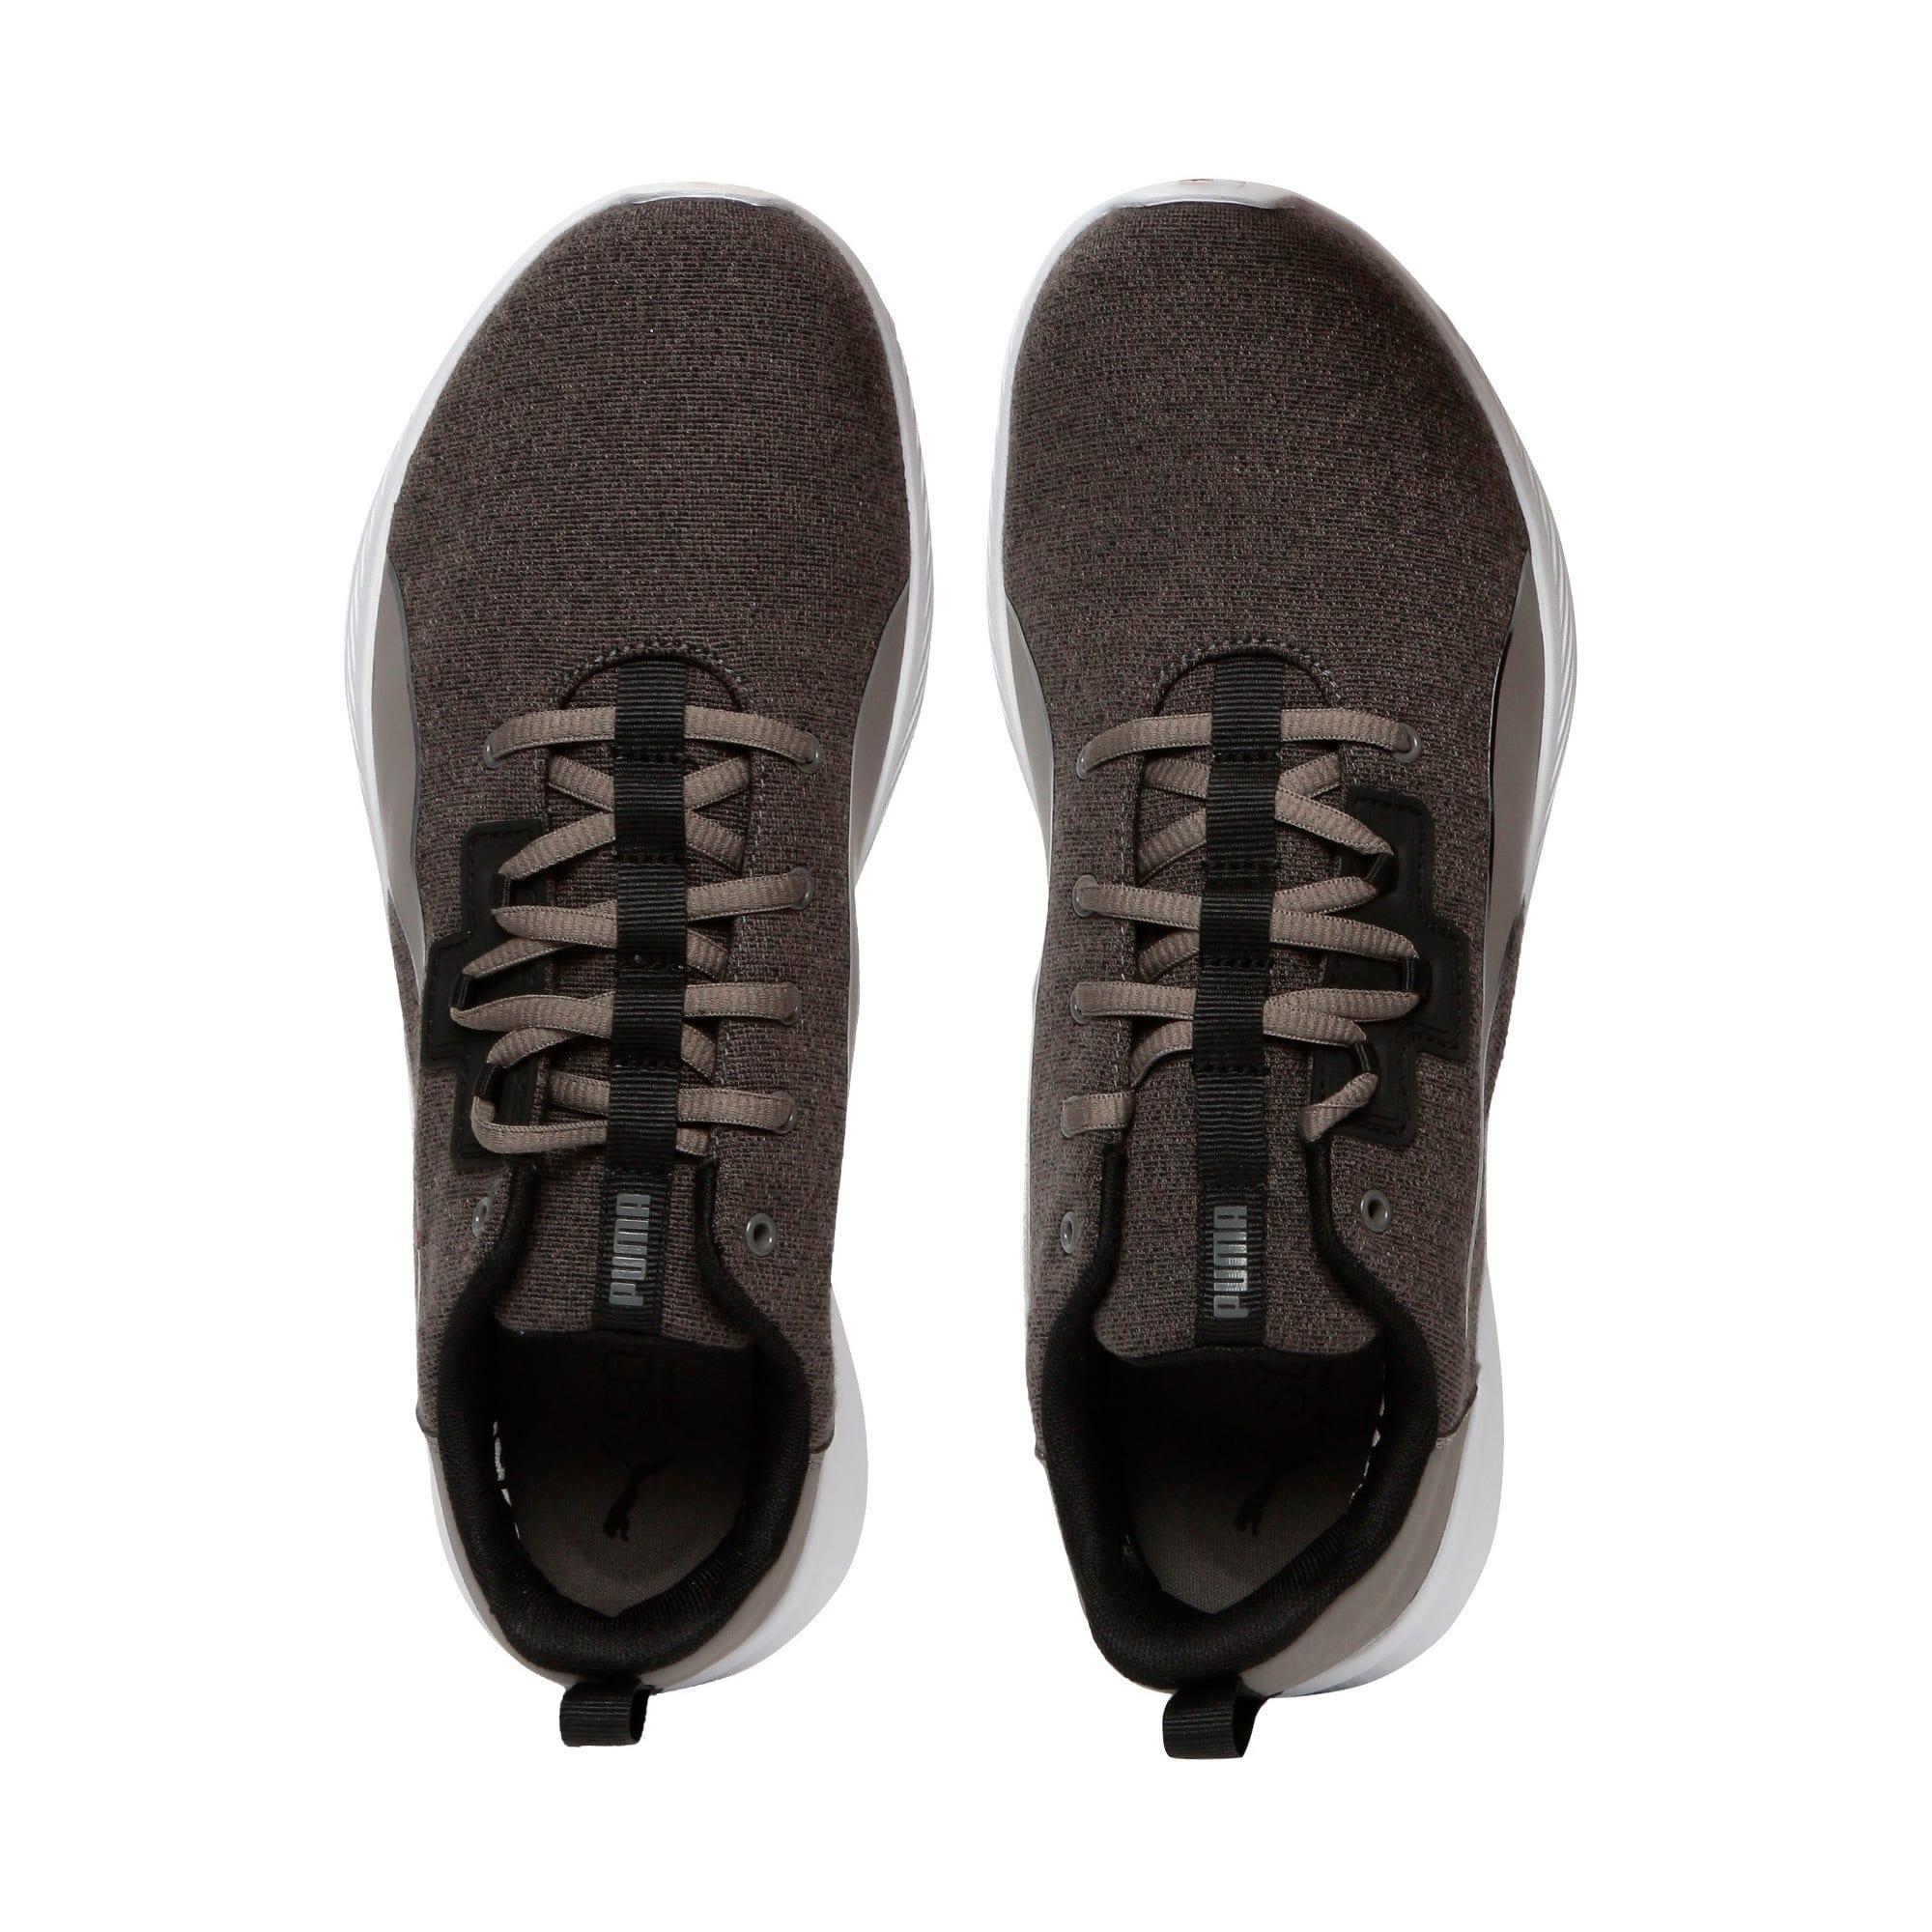 Thumbnail 6 of Tishatsu Runner Knit, Charcoal Gray-Puma Black, medium-IND